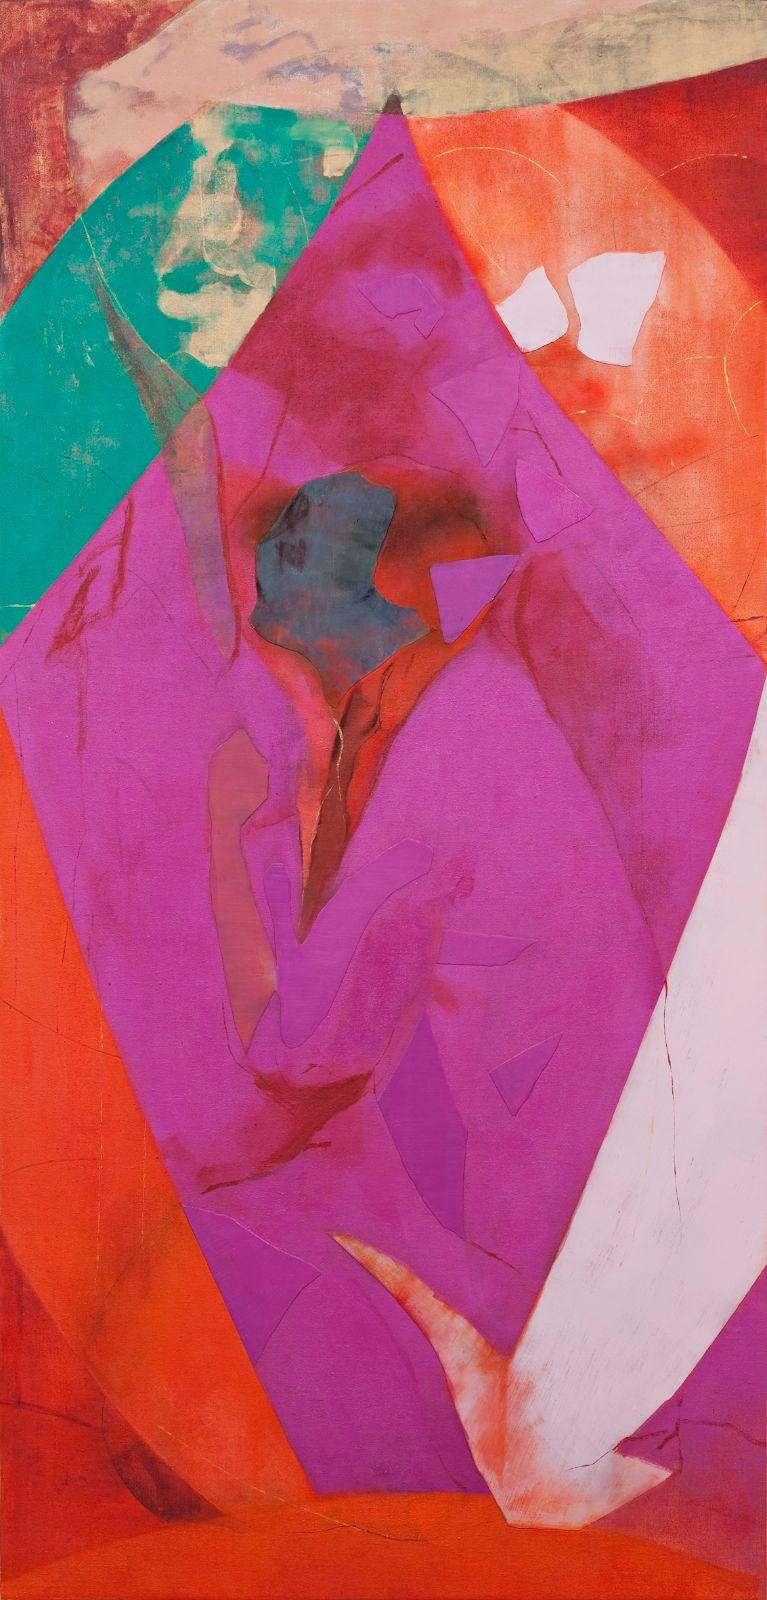 Det er deg vel unt (Rublev), 2009, oil and acrylic on canvas over panel, 200 x 96 cm